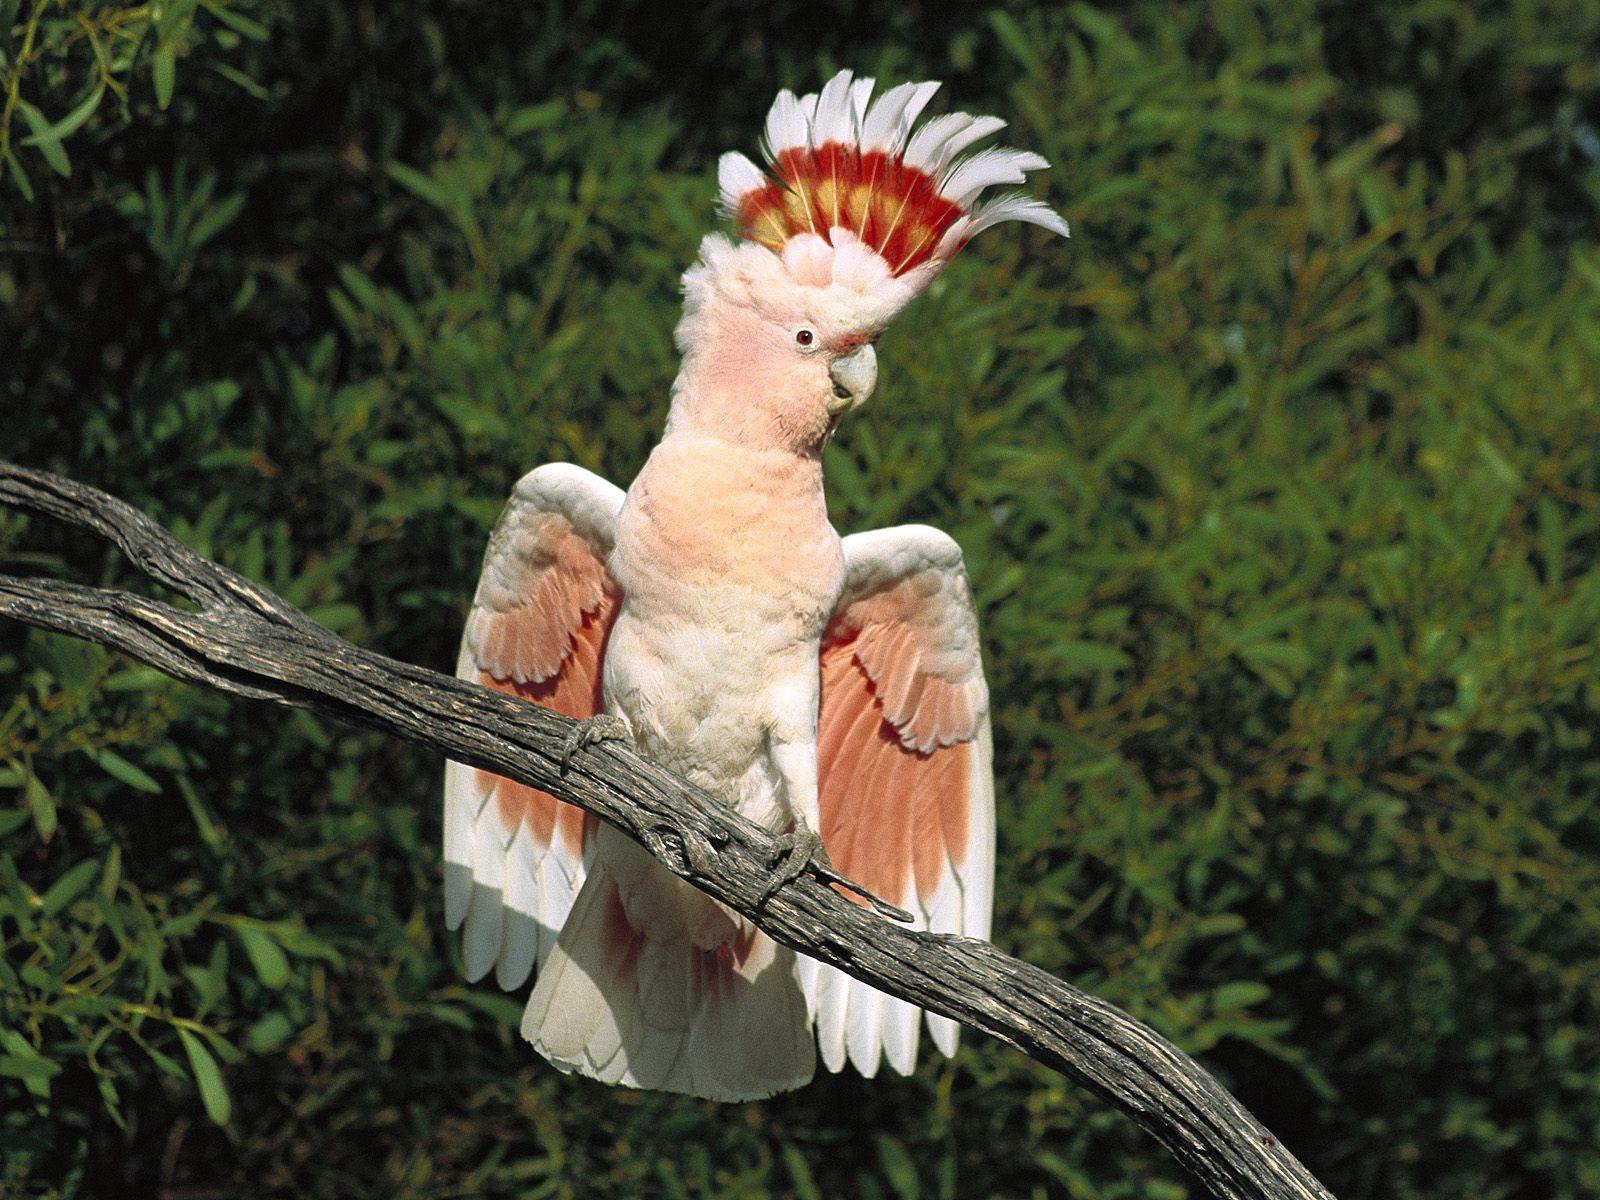 Awesome bird